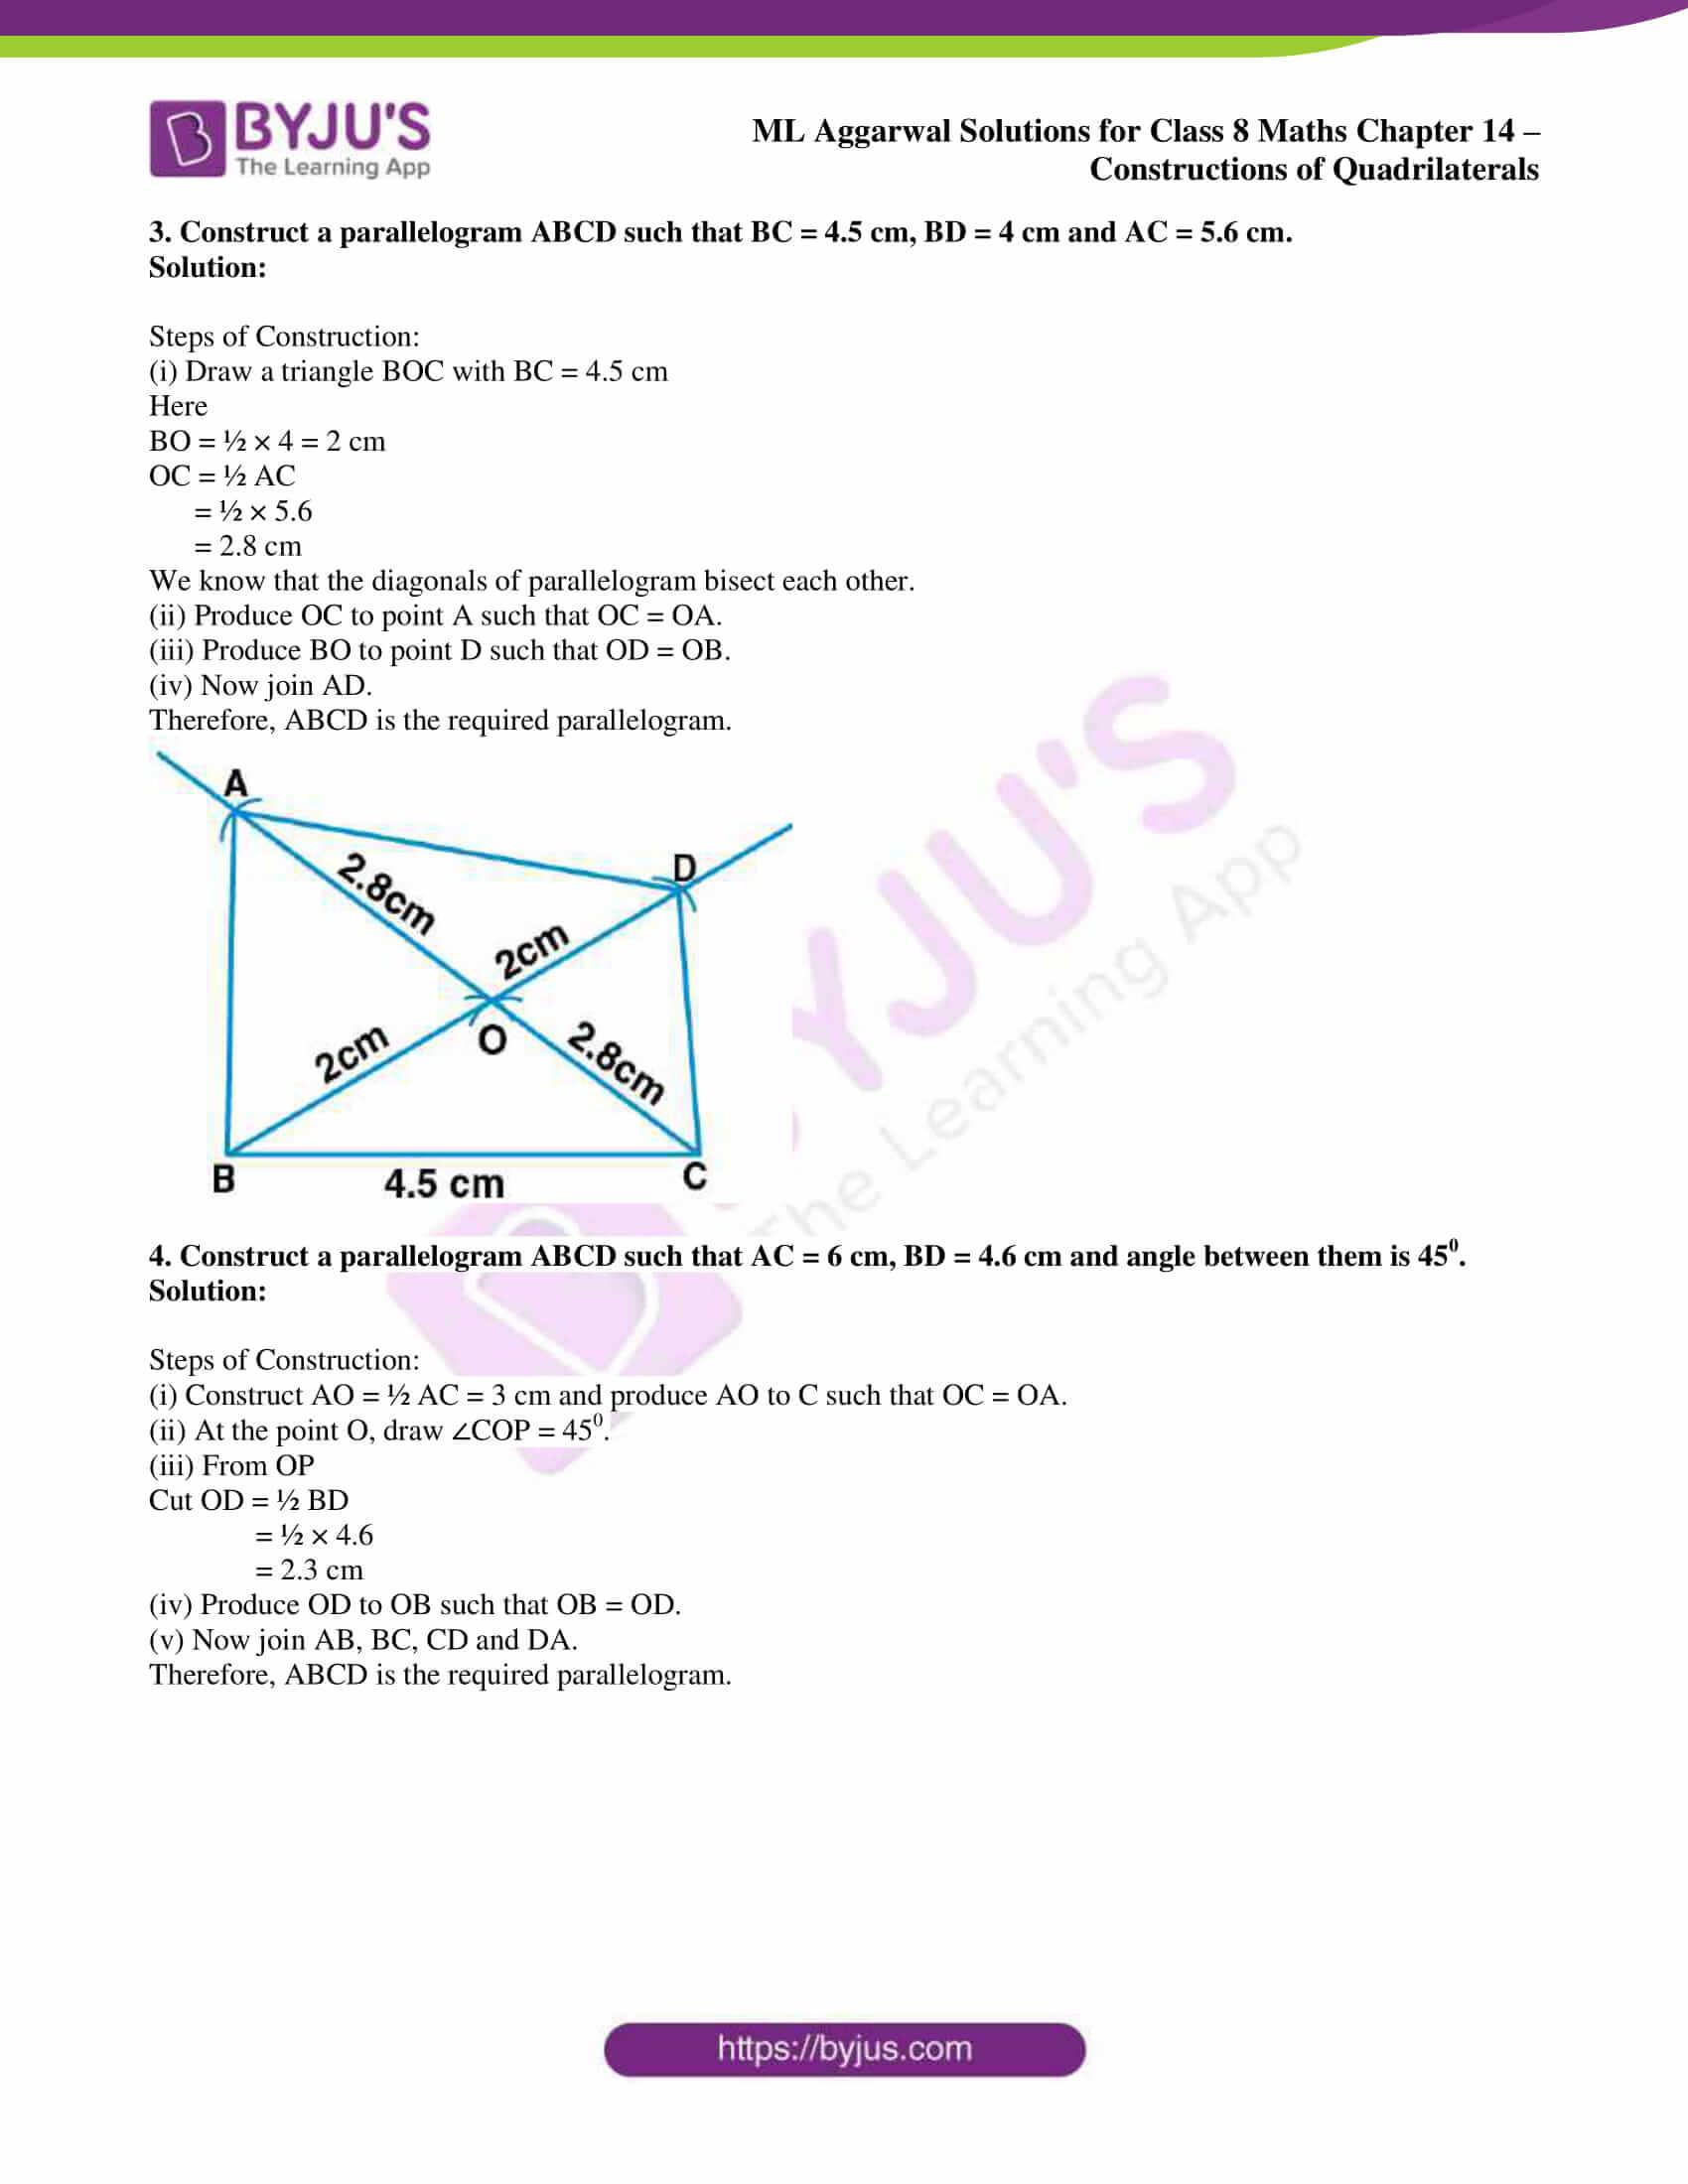 ml aggarwal sol class 7 maths chapter 14 8